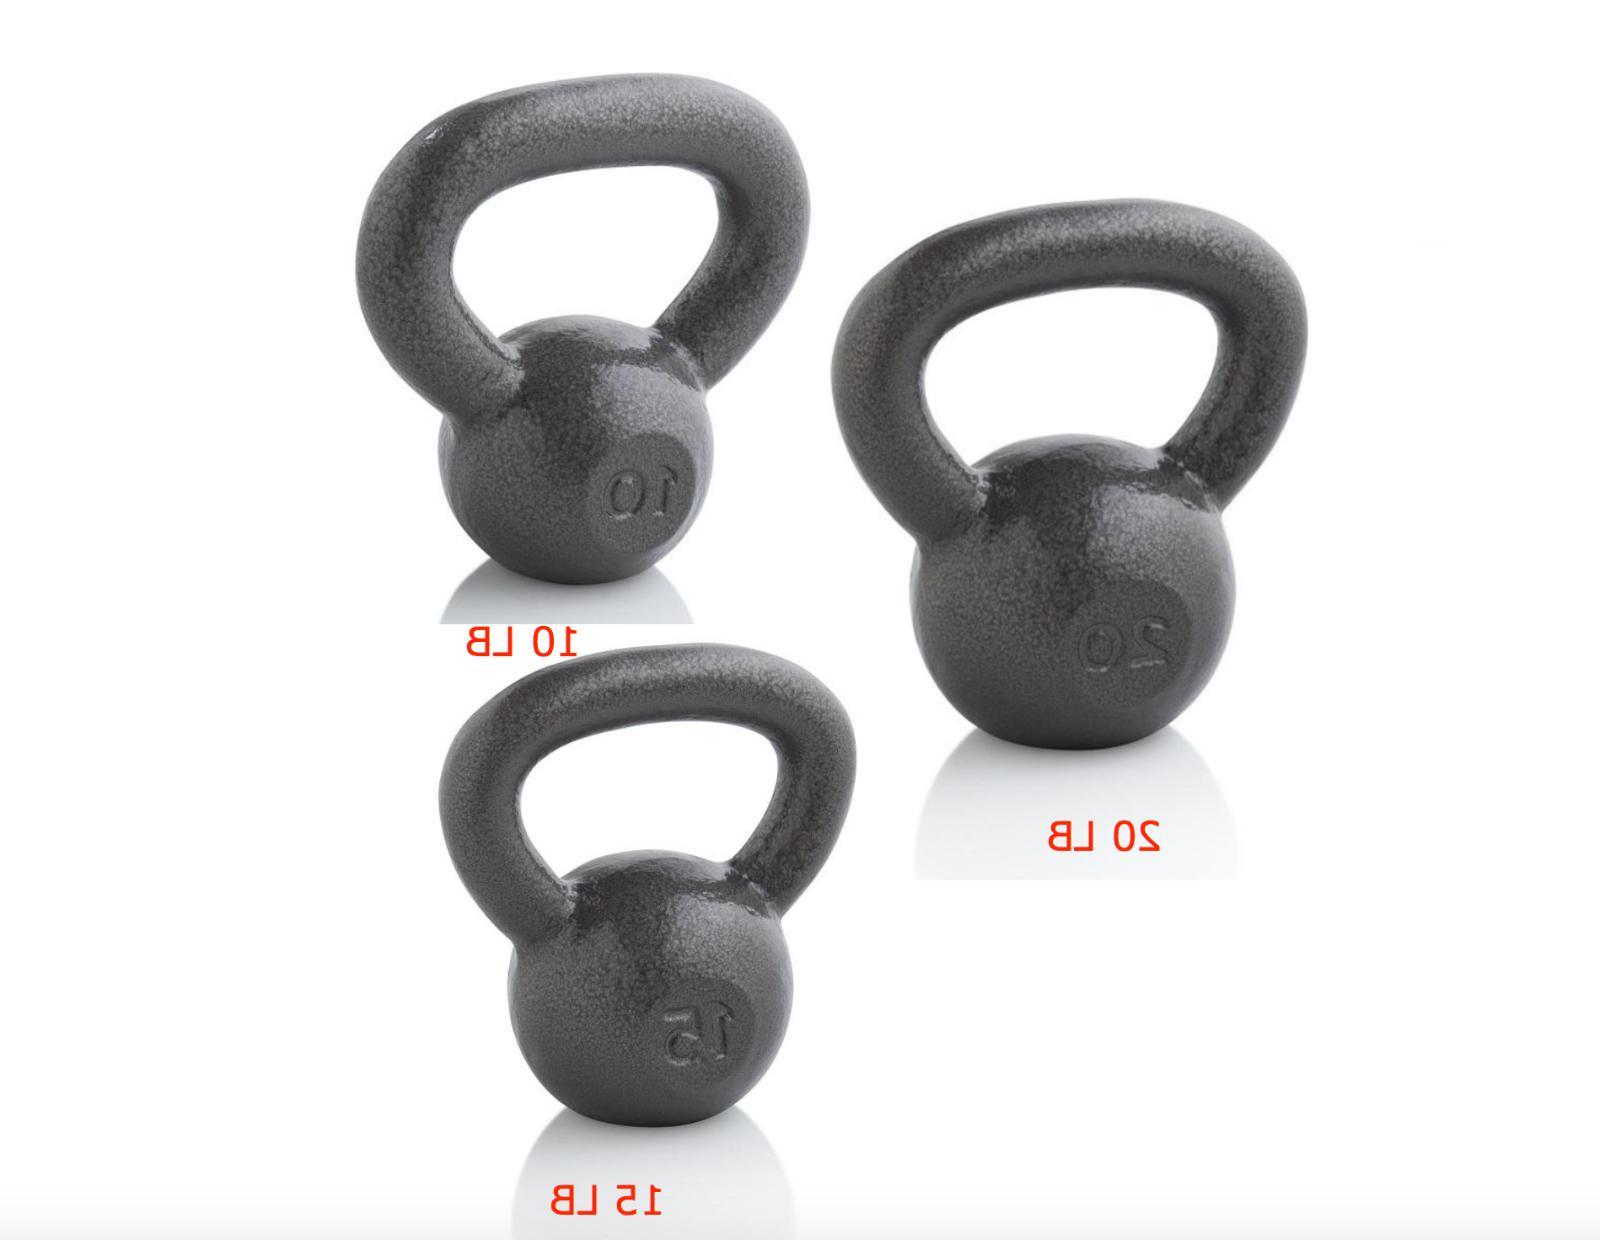 kettlebell tone muscles calorie burn workout fitness